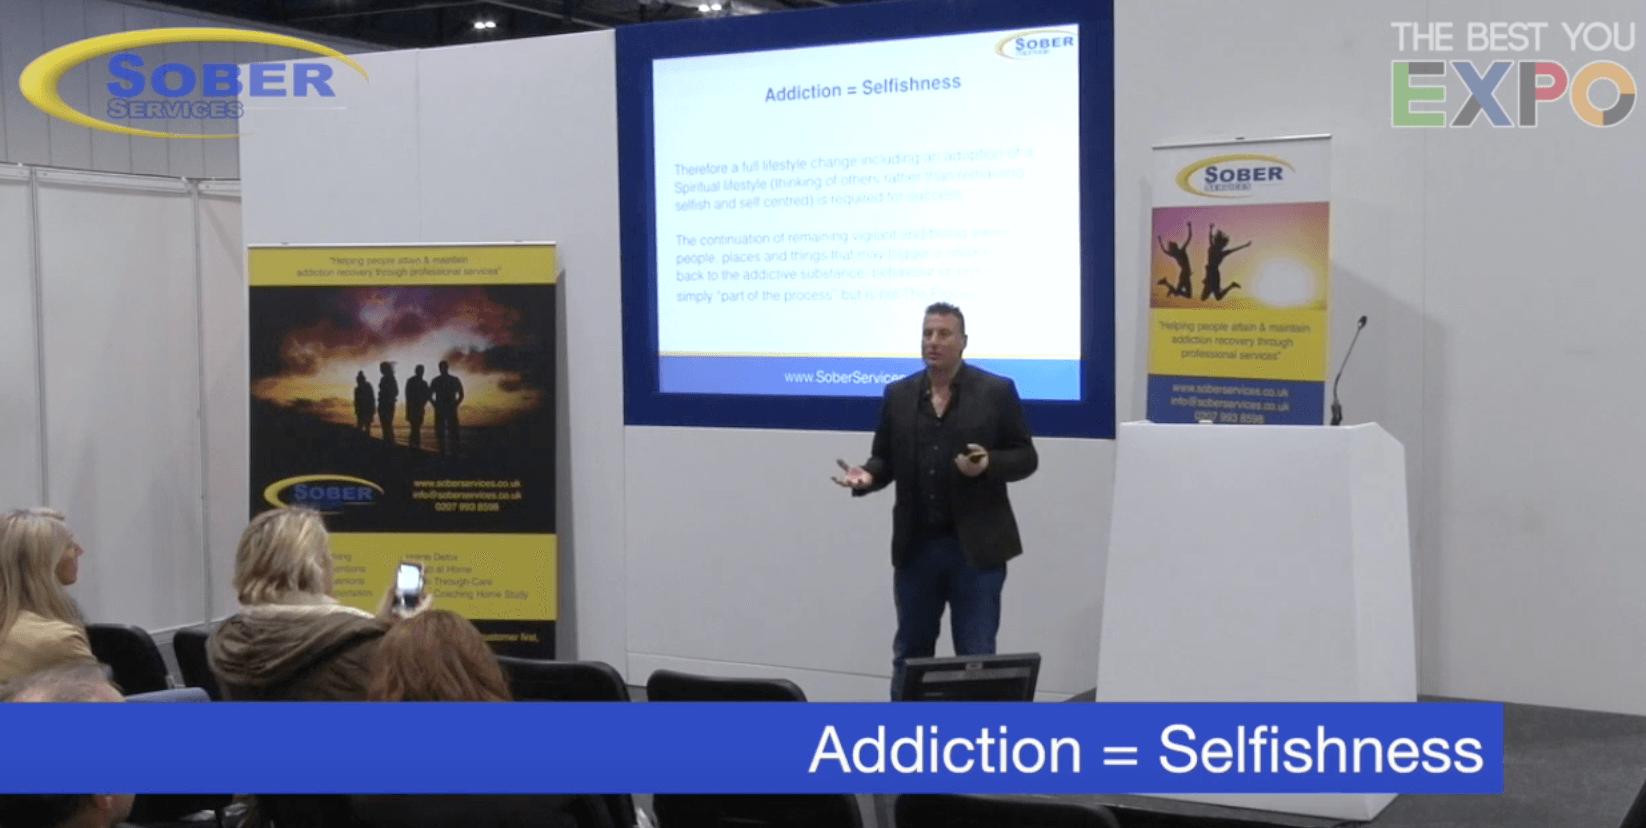 Addiction = Selfishness